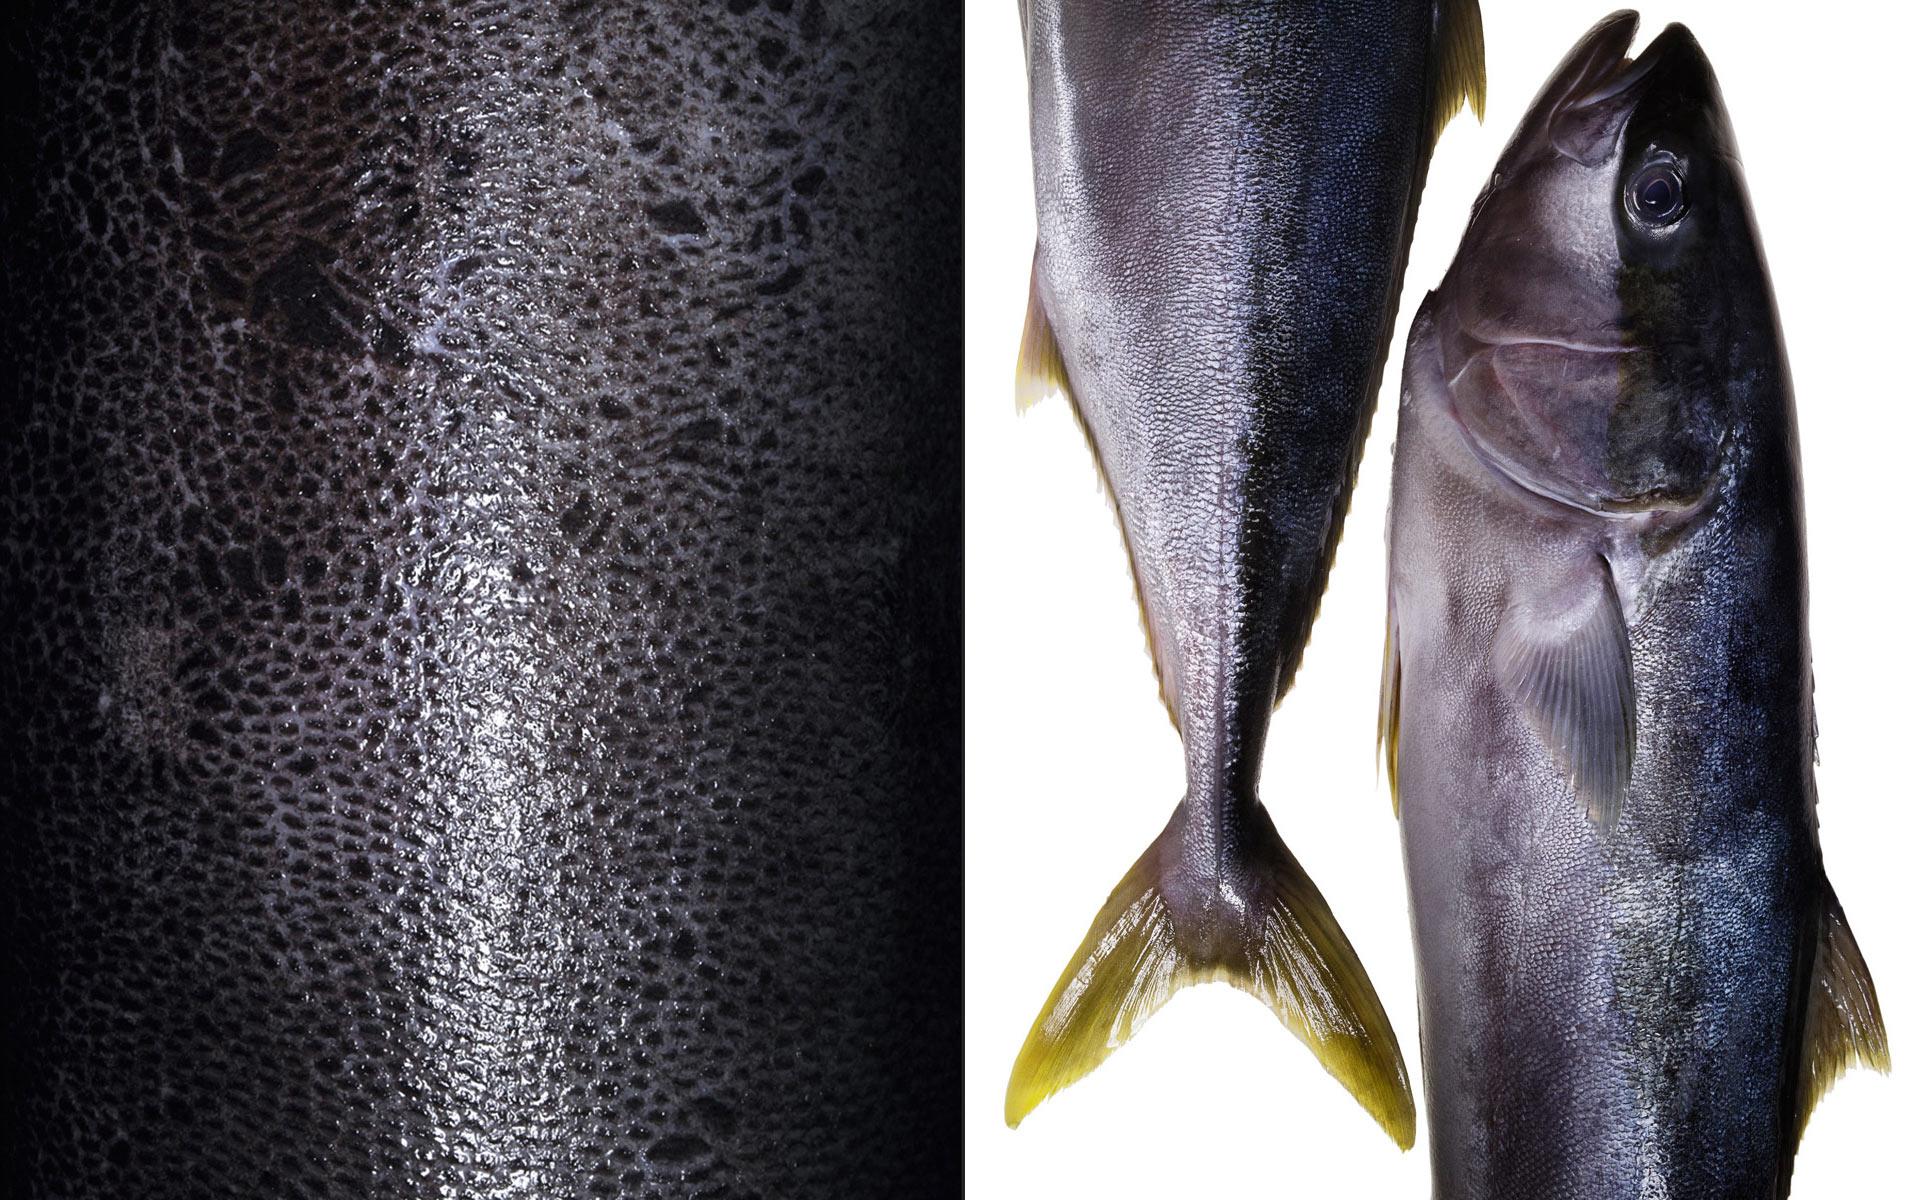 PR_DET_skin-fish_sq.jpg